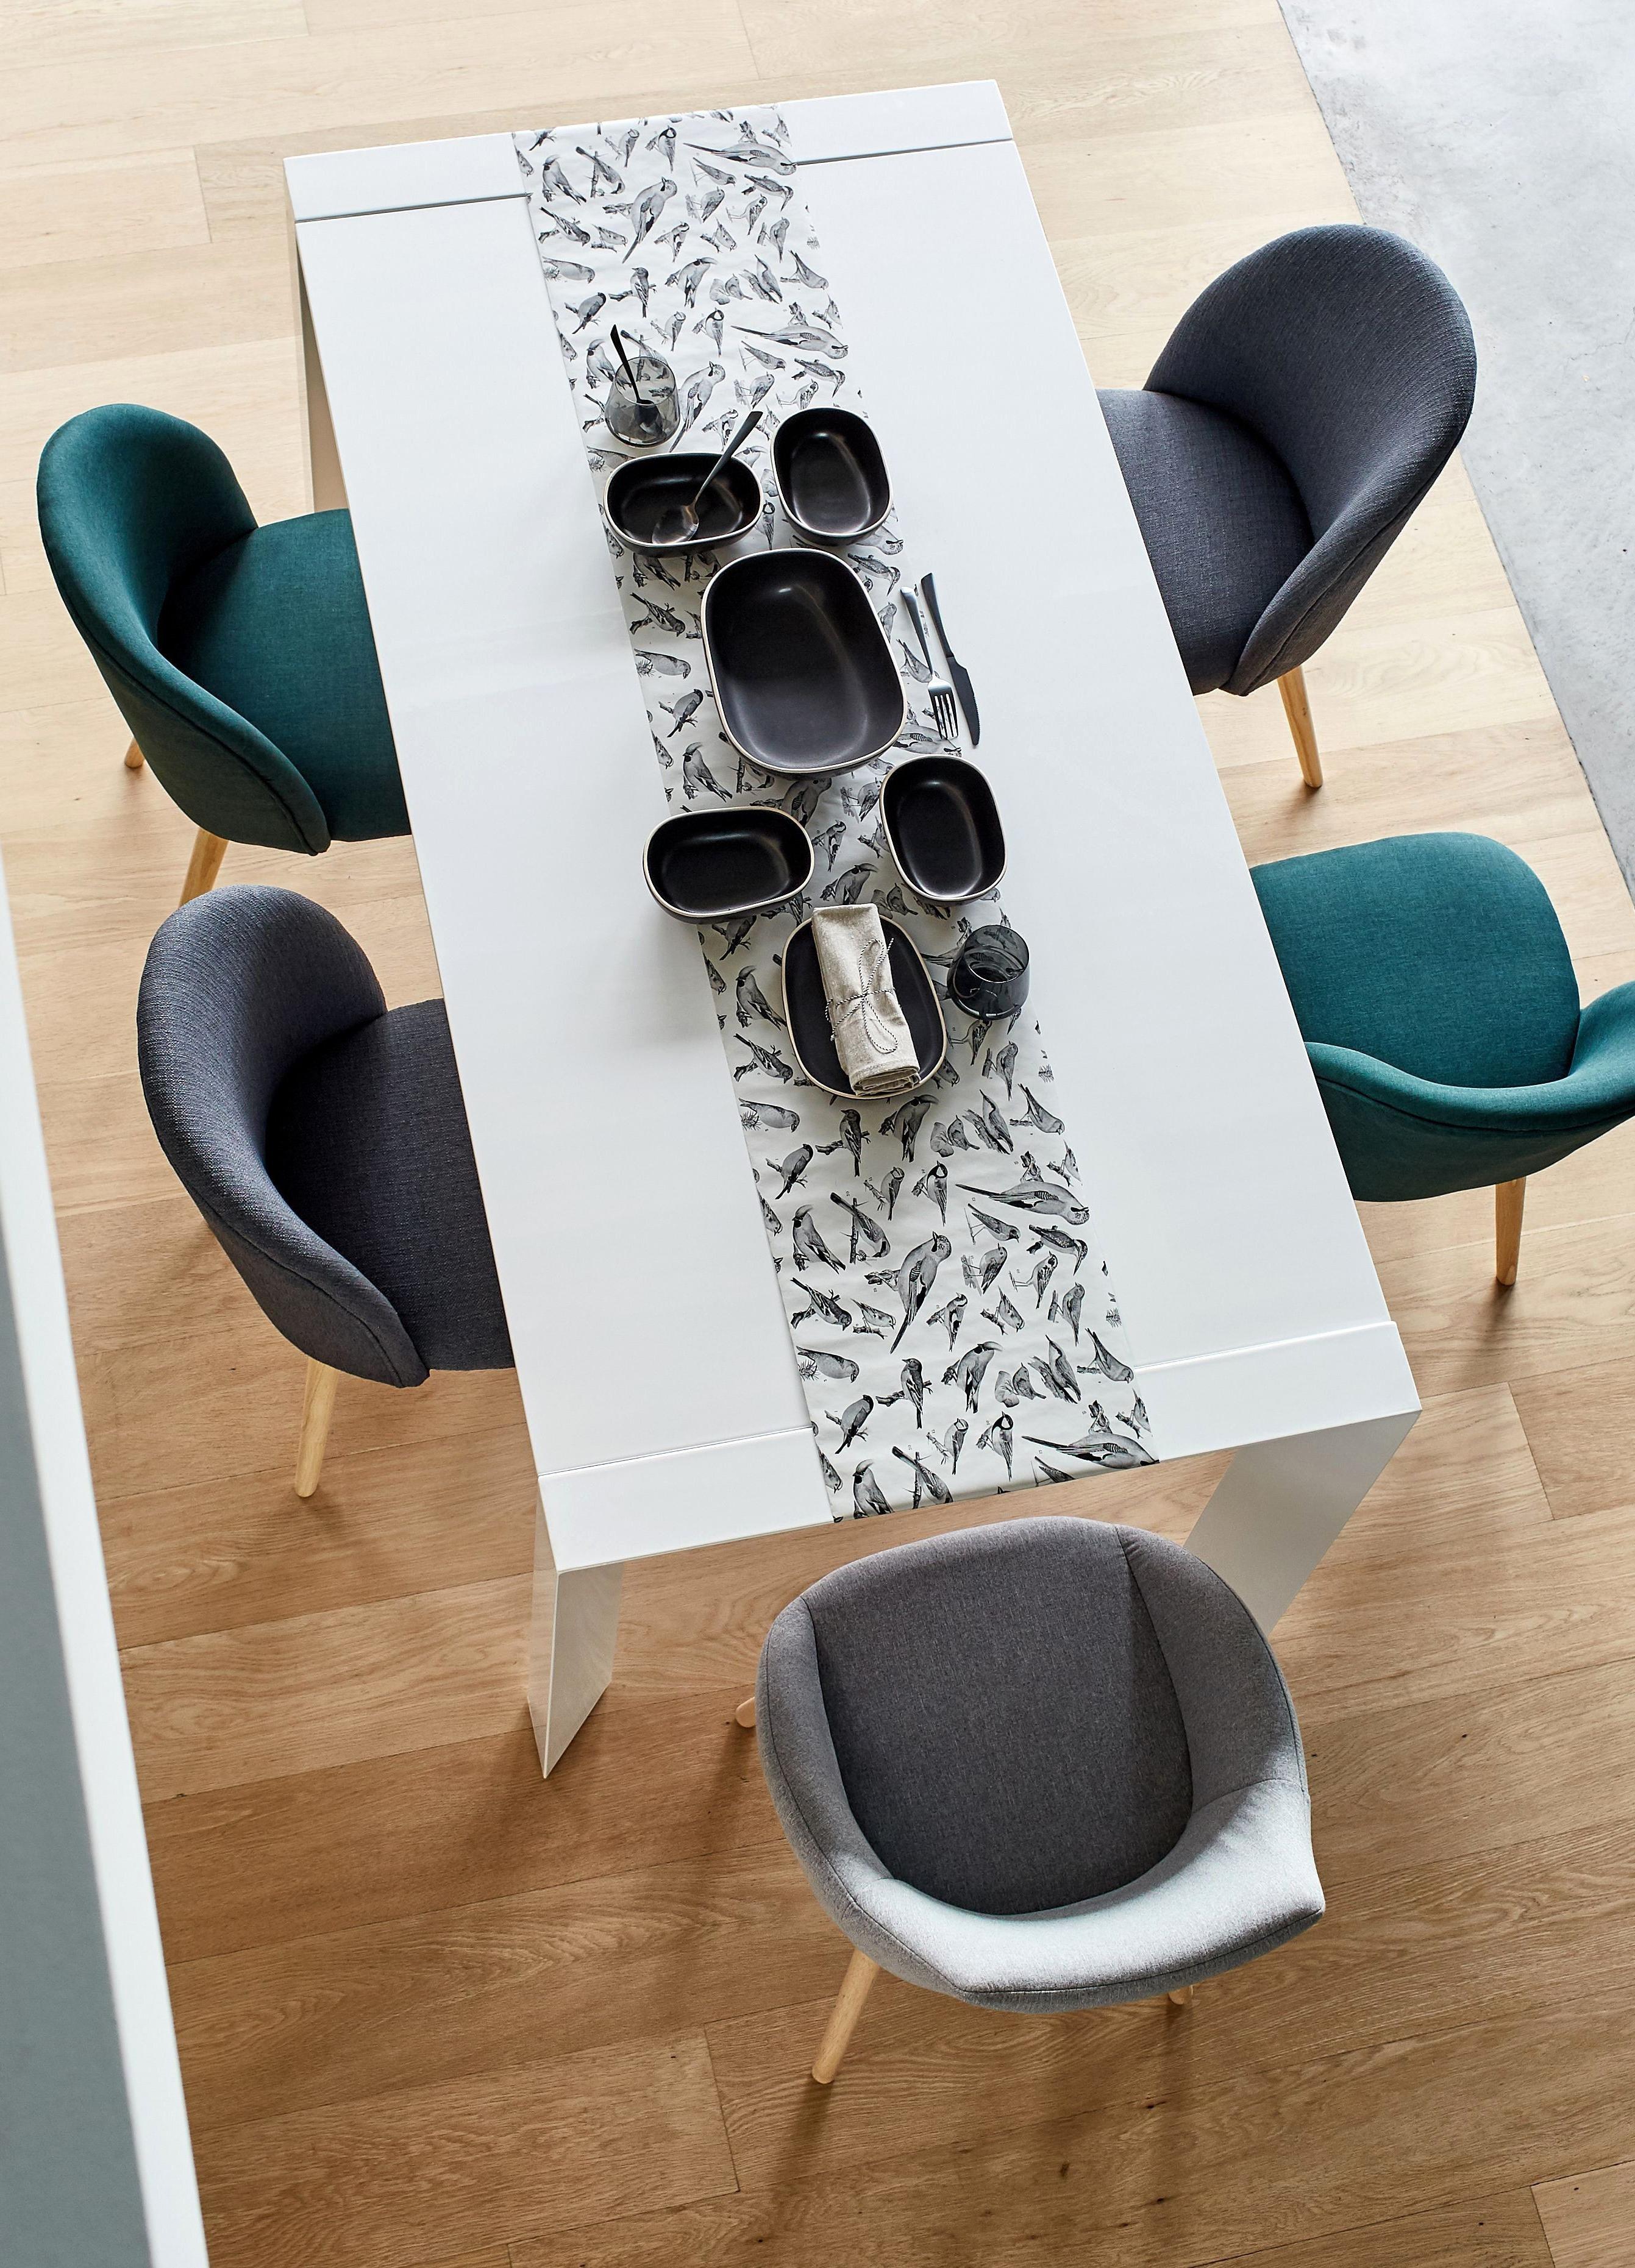 Bancos De Madera Para Interior De Ikea 0gdr Bancos De Madera Para Interior Baratos Impresionante Imagenes Suelo